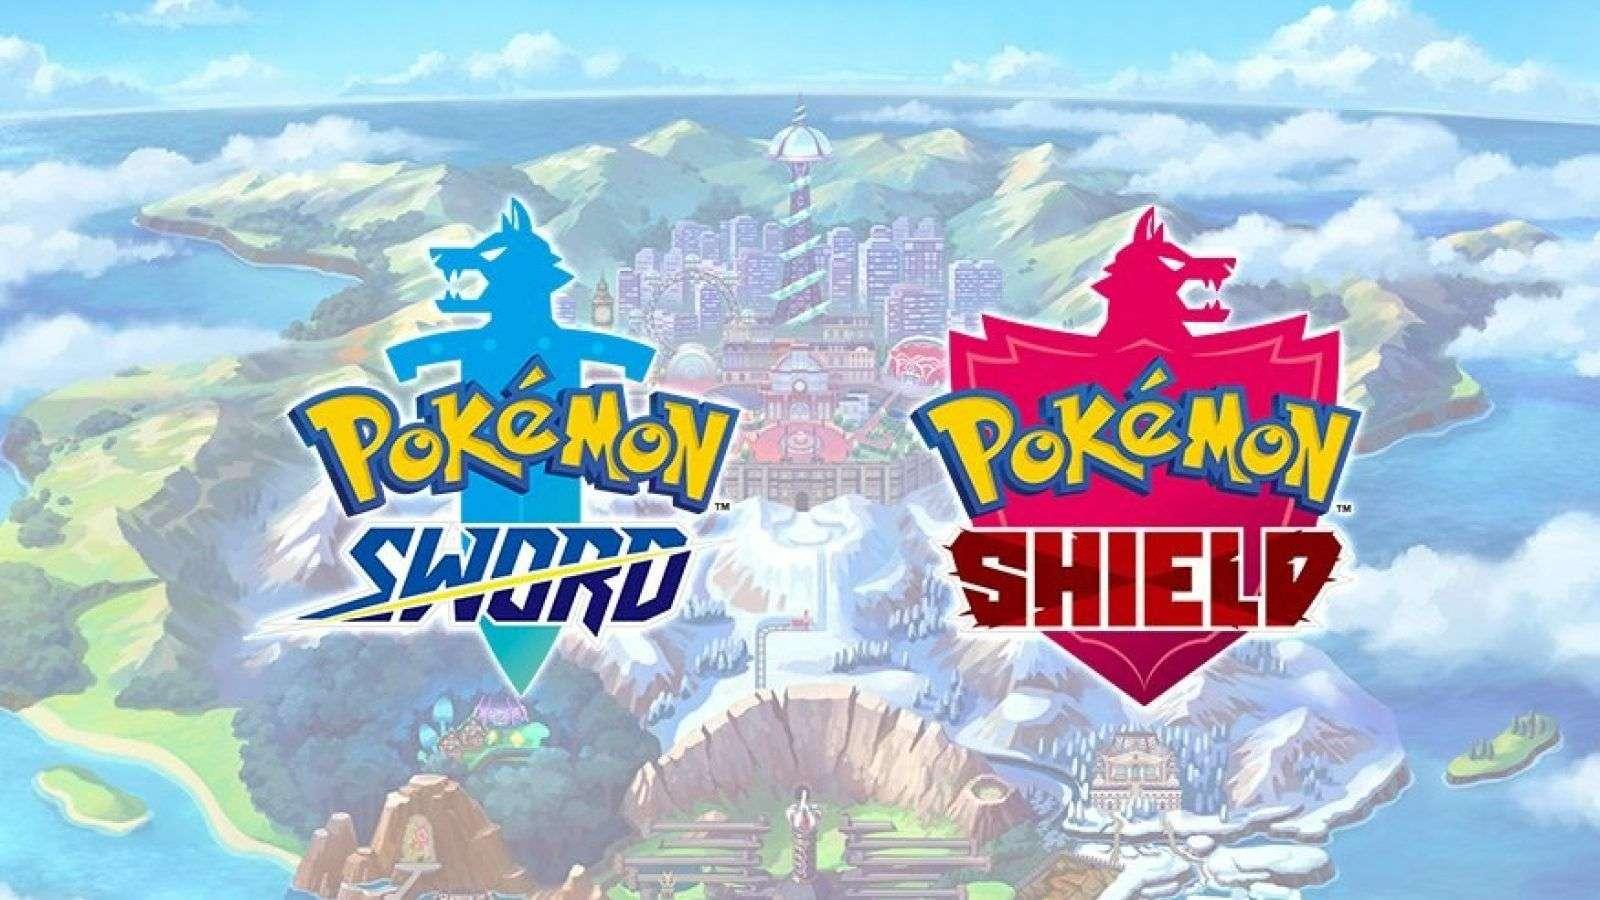 Pokémon Spada Pokémon Scudo